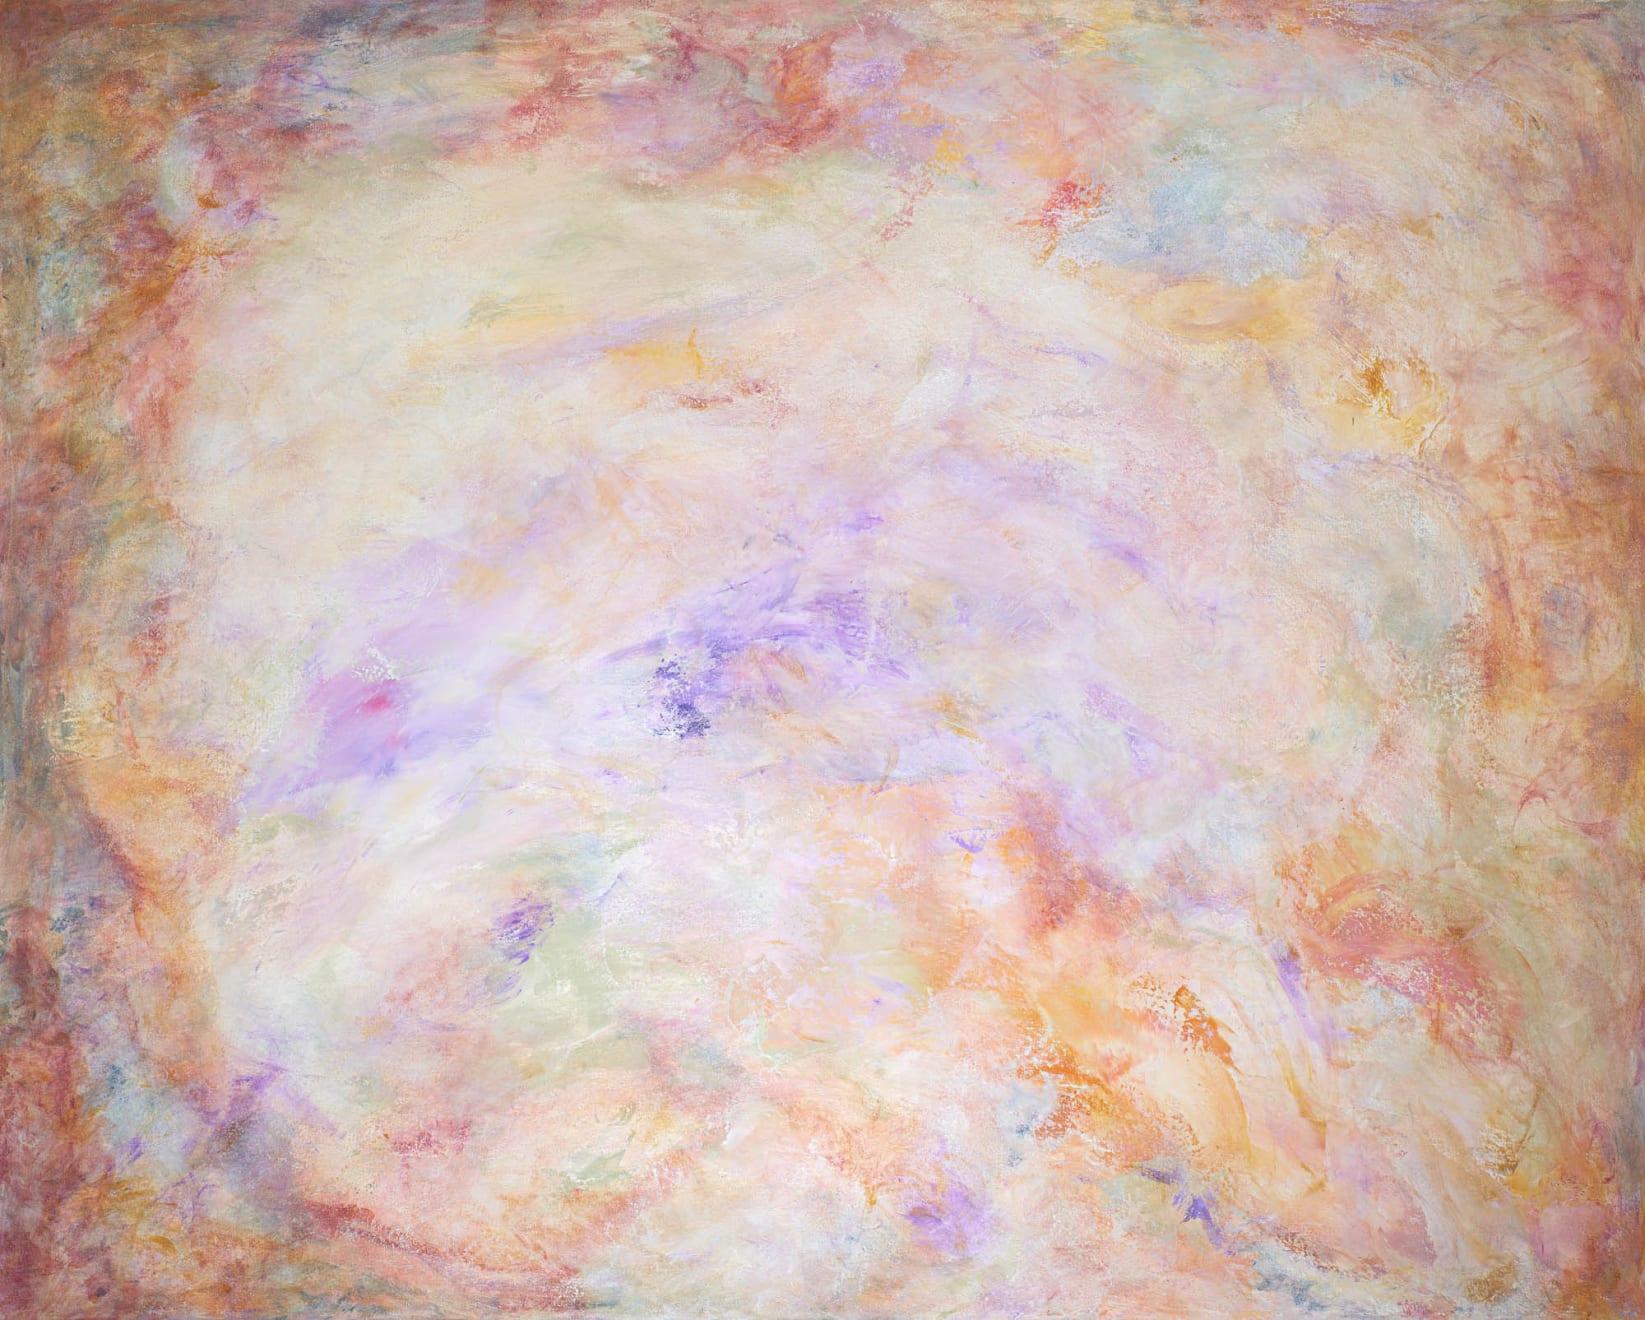 Patricia Qualls, Sacred Space, 2019